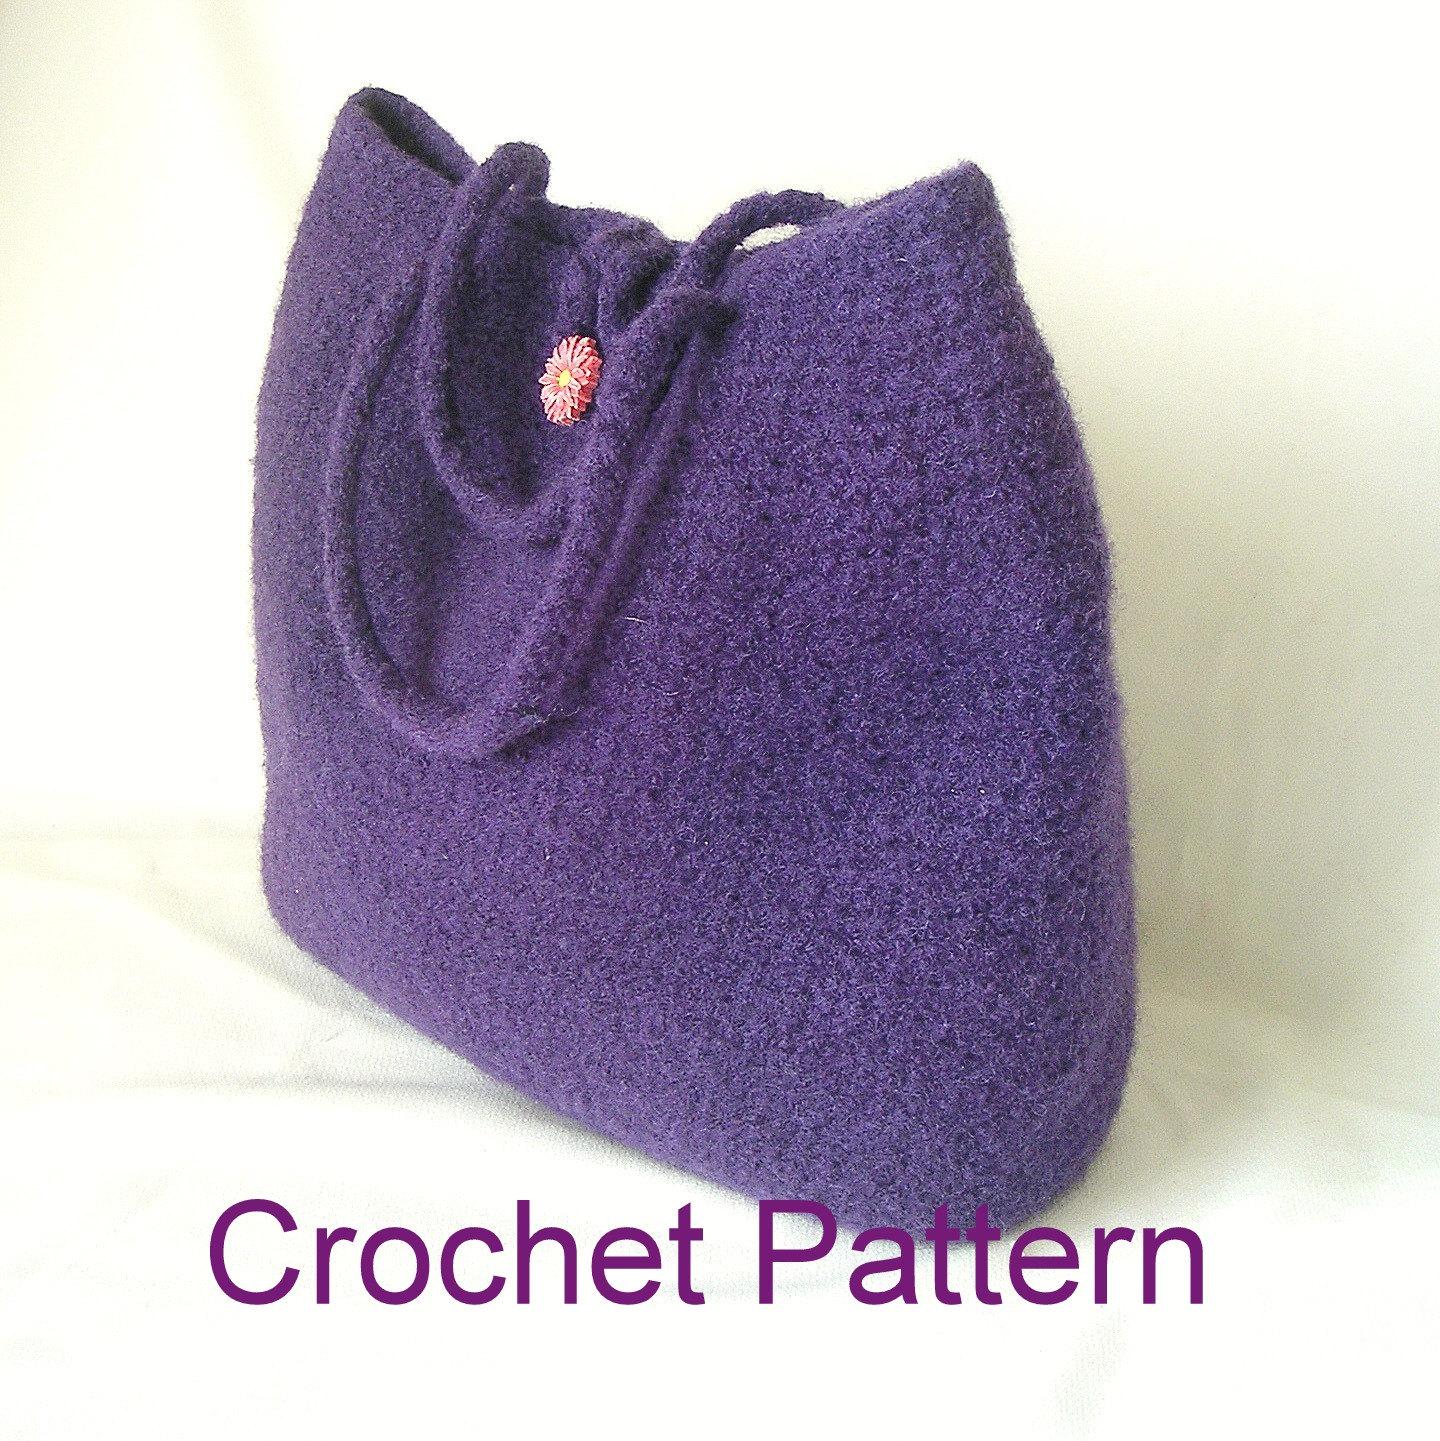 How To Make Crochet Handbags : How to Make Crochet Felted Bag Pattern by GraceKnittingPattern